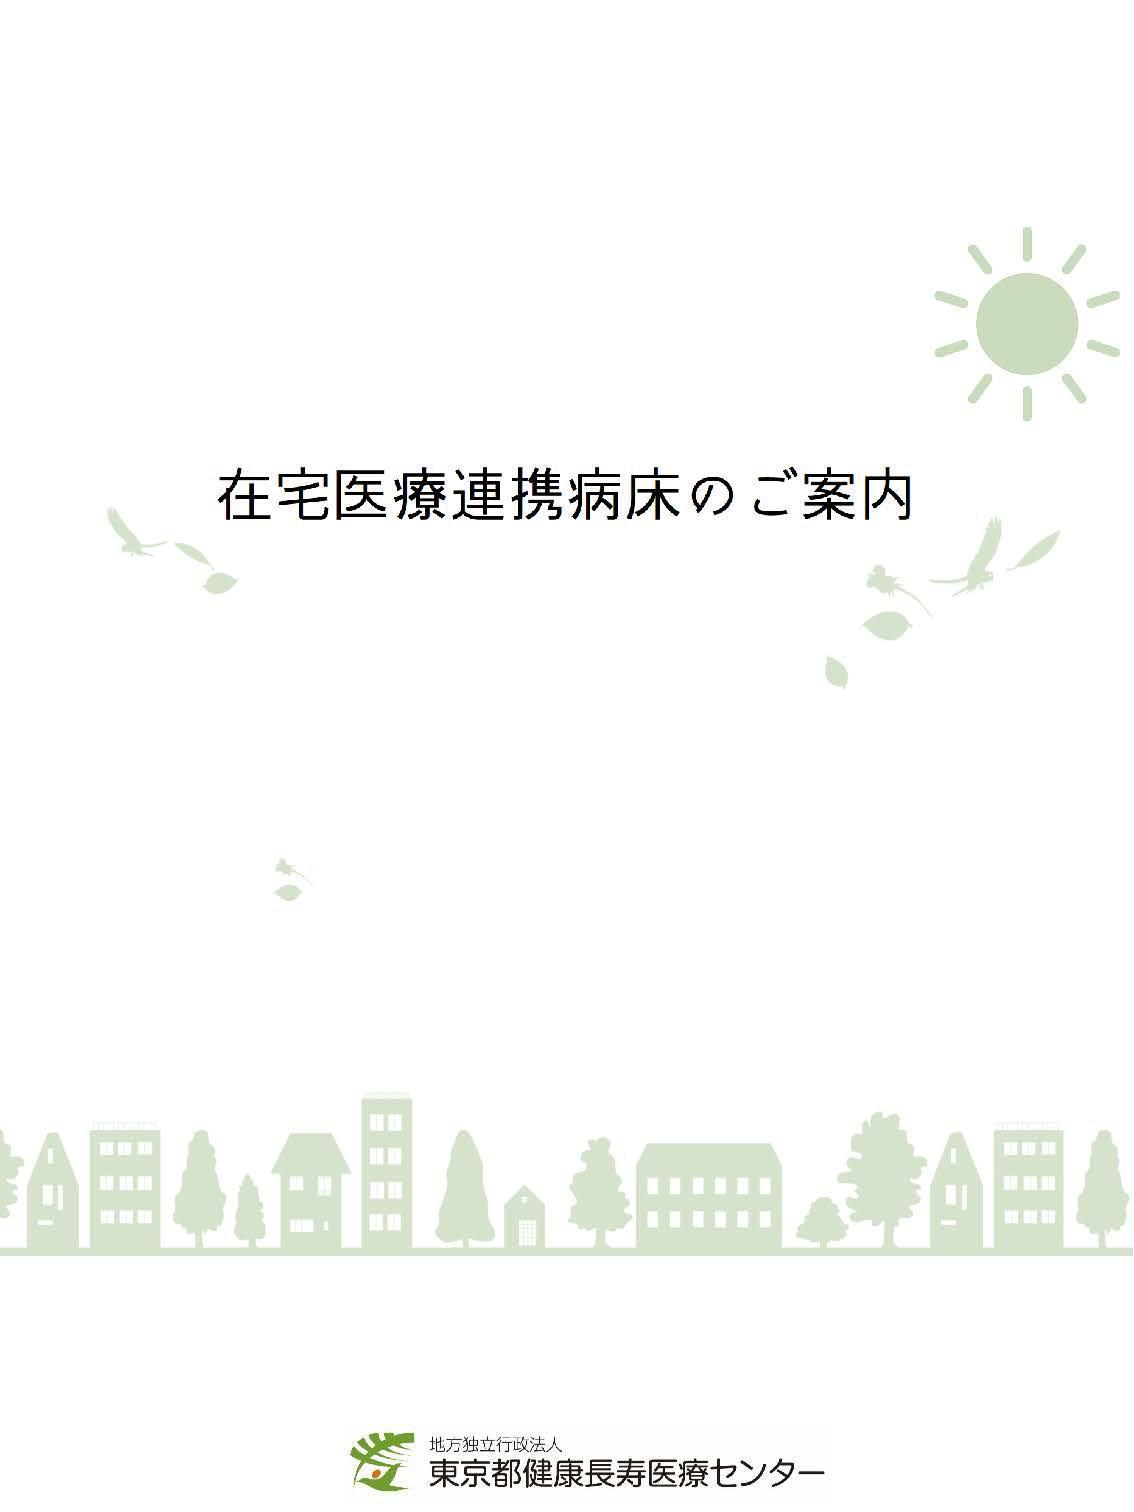 zaitakuiryo_ページ_1.jpg